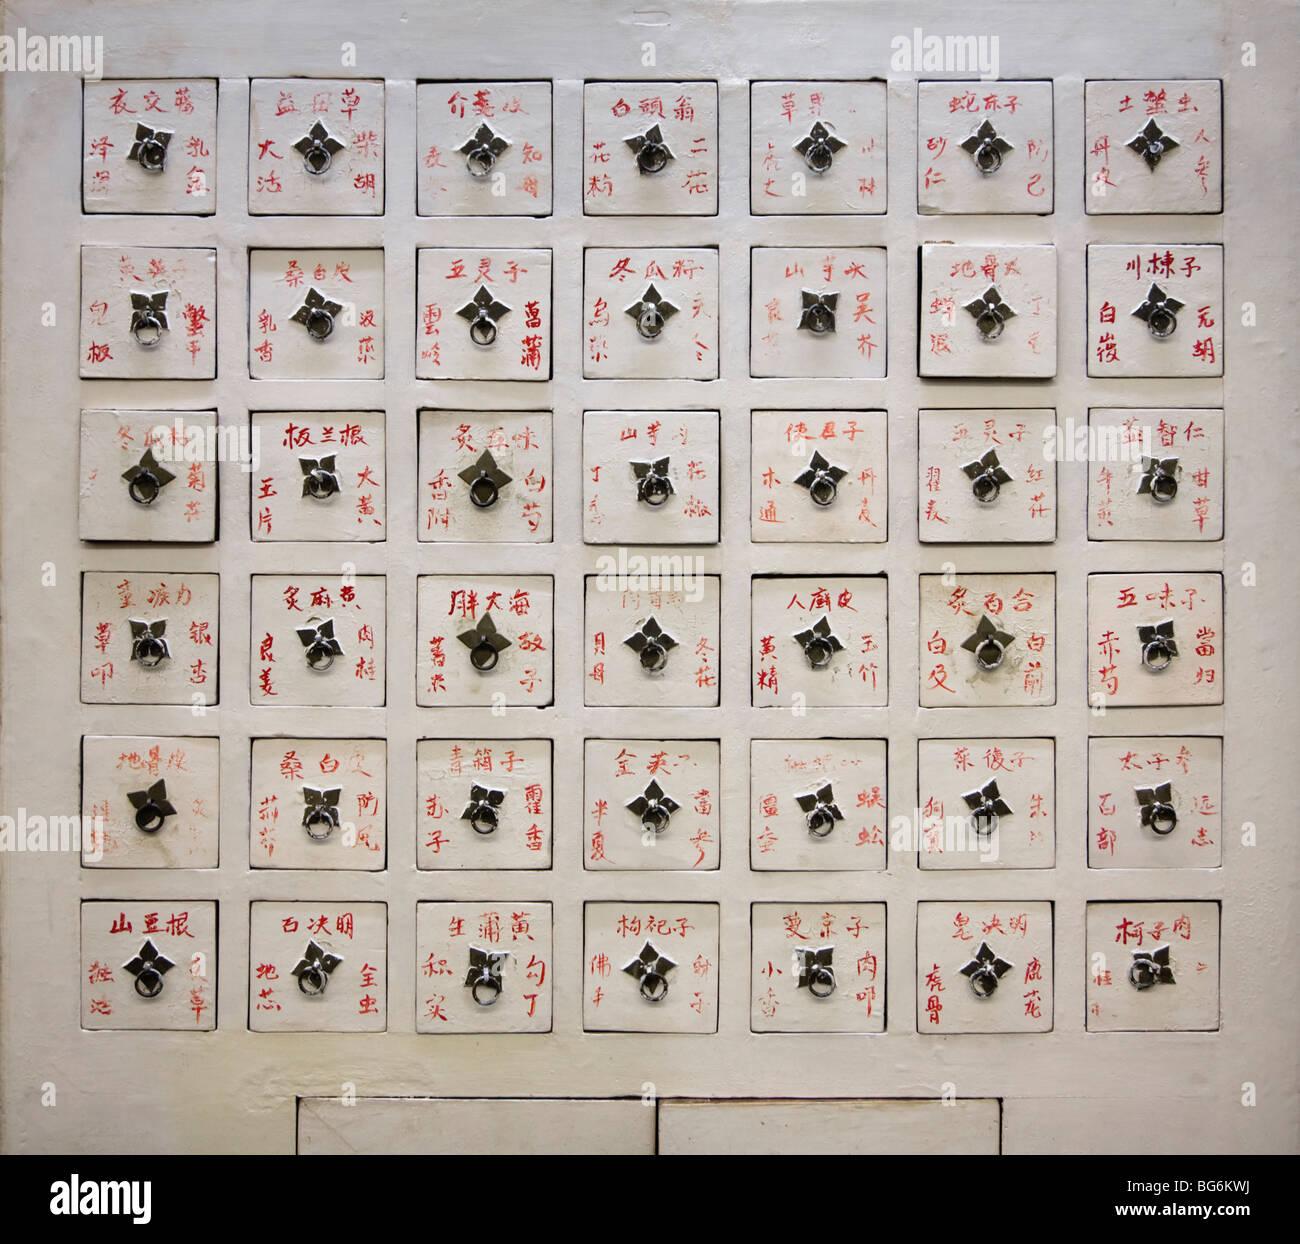 Antique Chinese medicine cabinet. - Antique Chinese Medicine Cabinet Stock Photo: 27192190 - Alamy